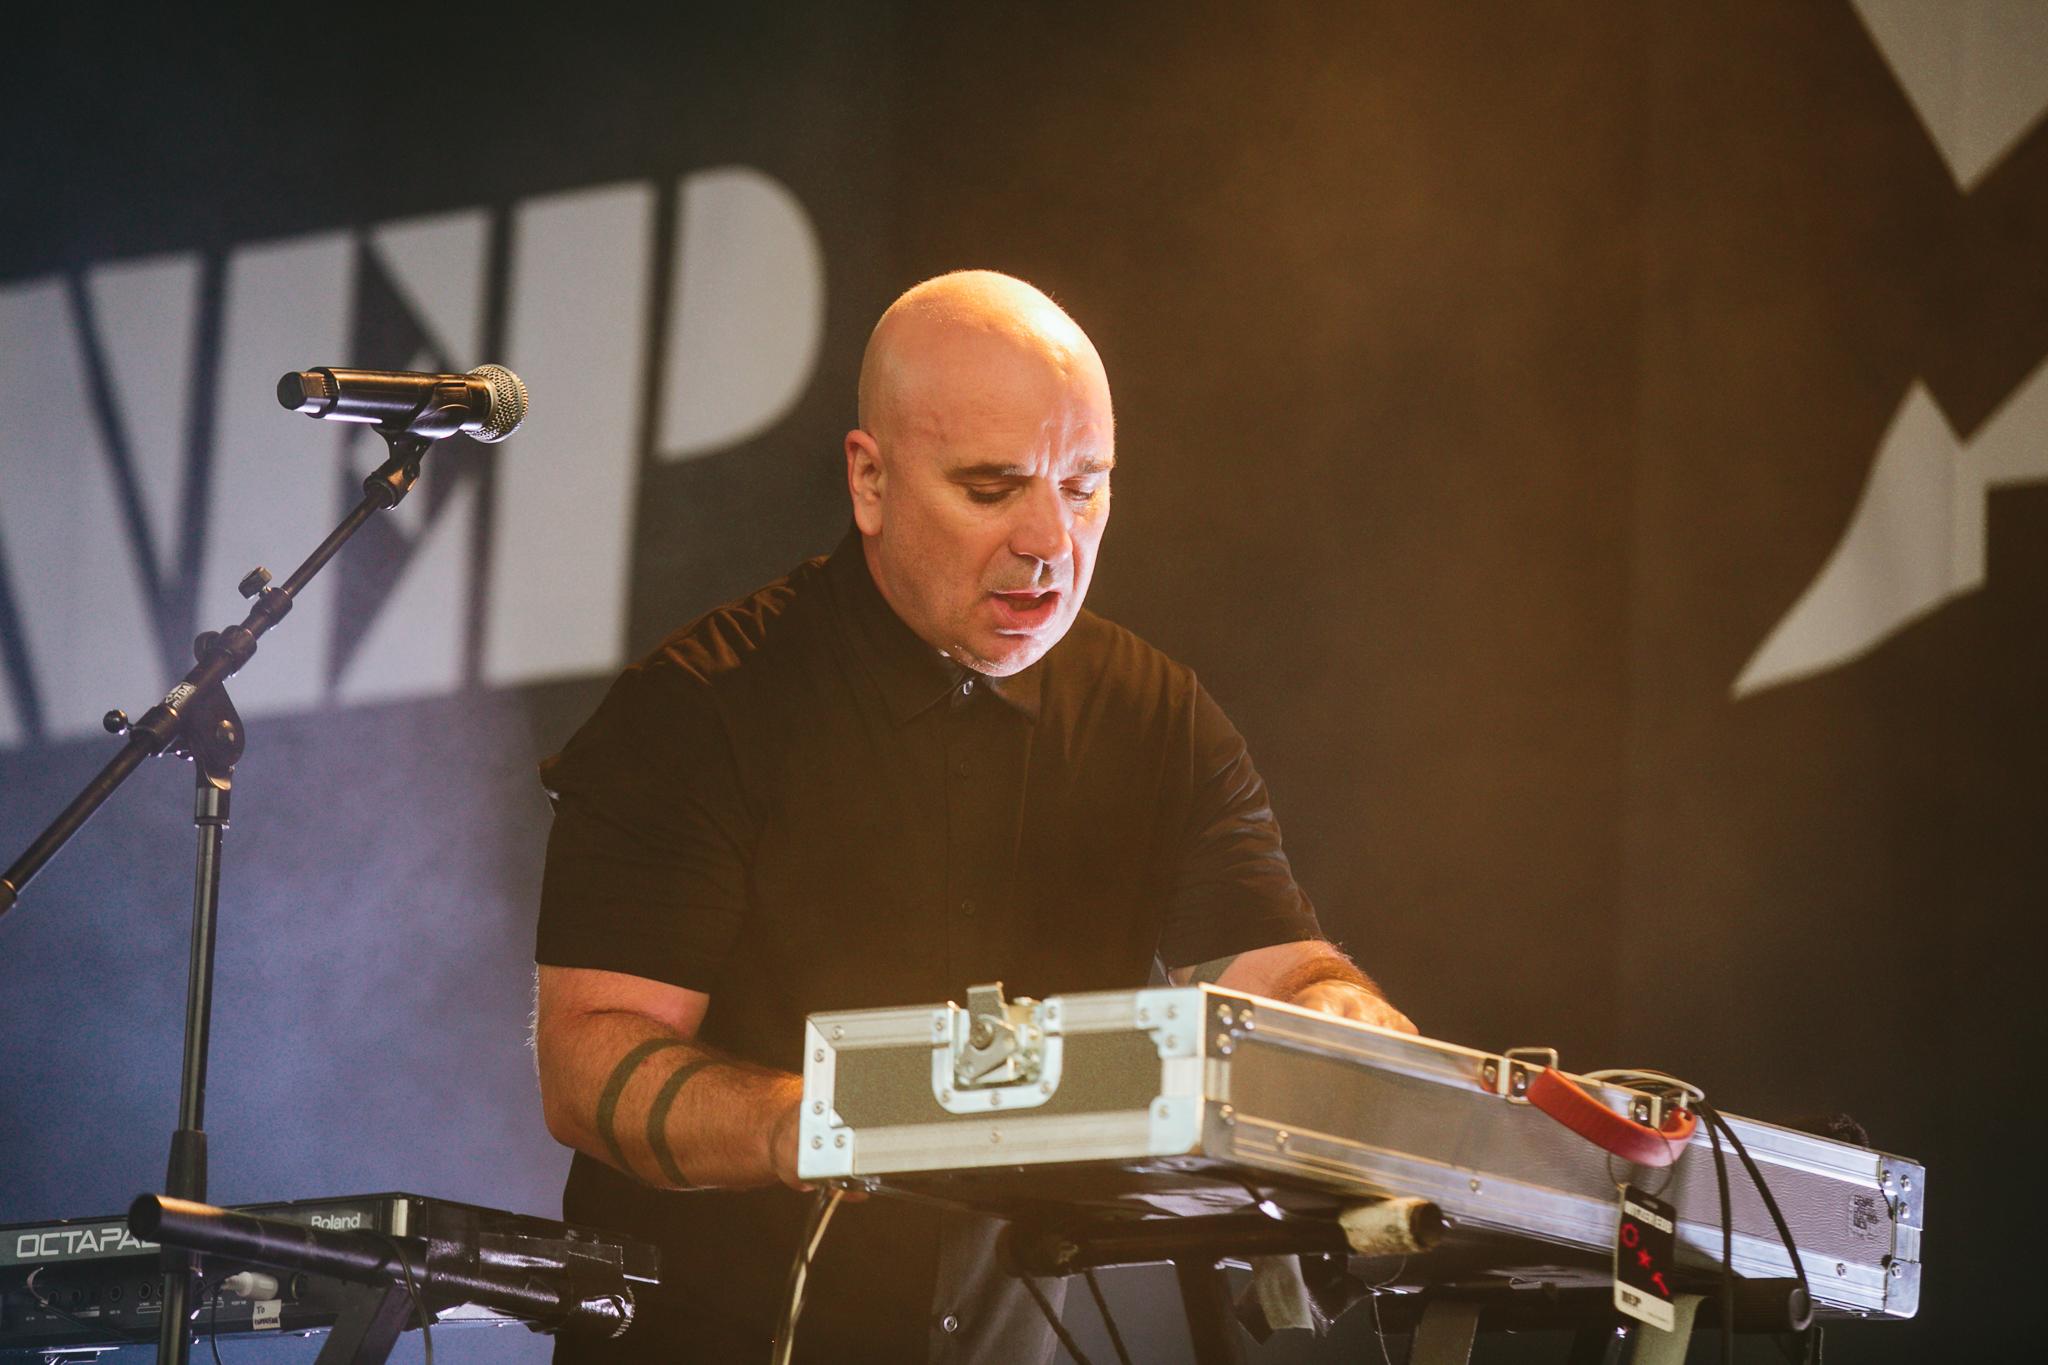 Nitzer Ebb at Amphi Festival 2019, Photo by Chris W. Braunschweiger